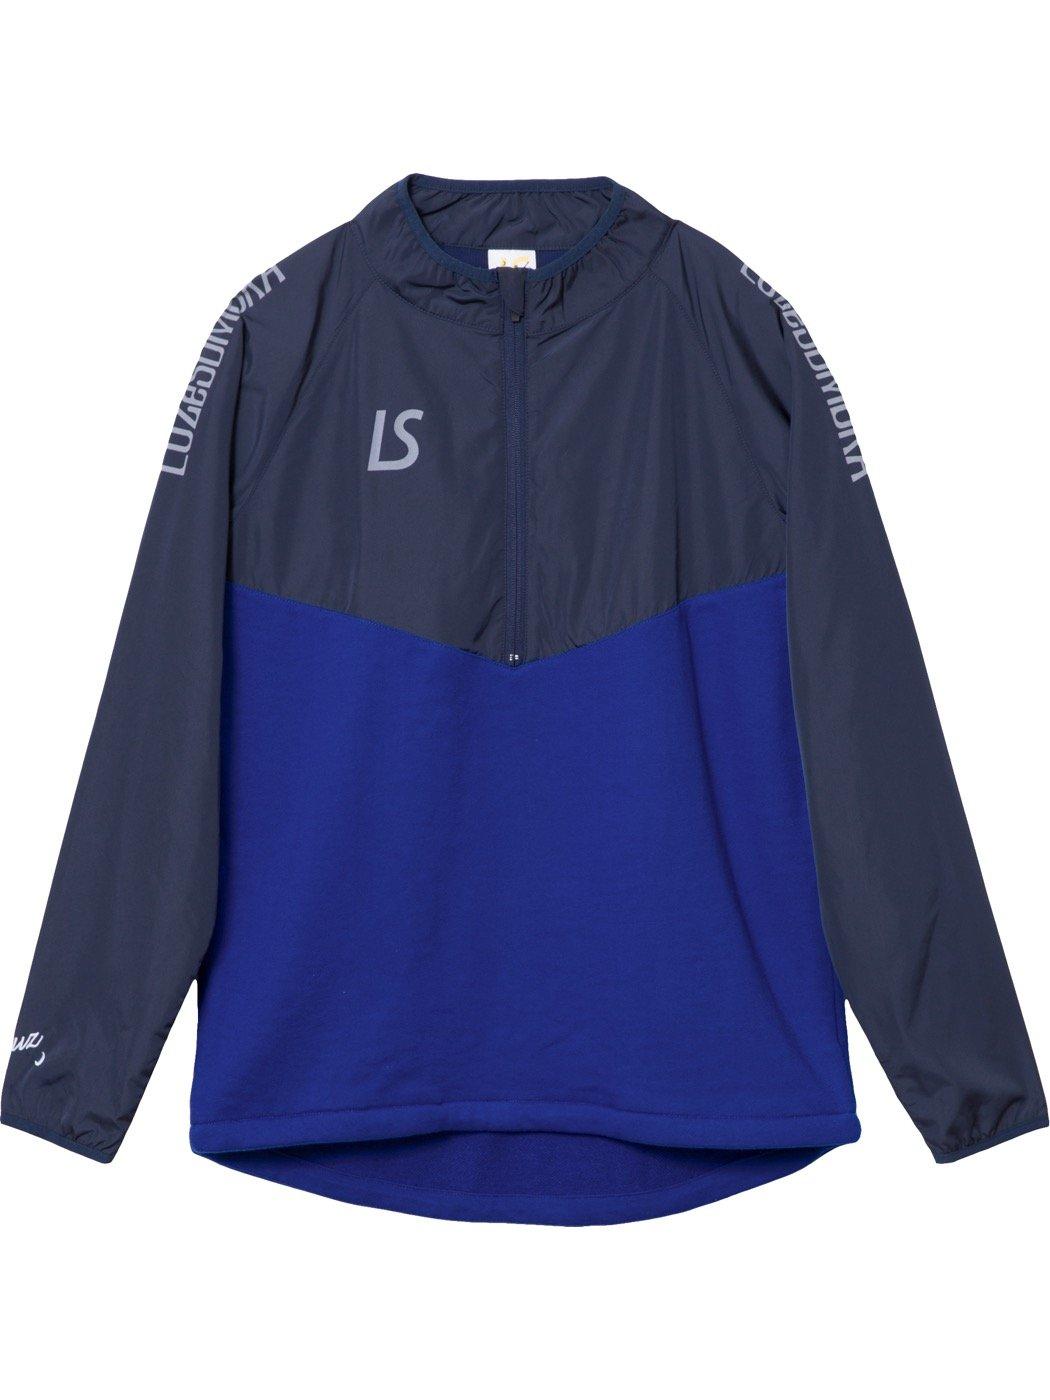 LUZeSOMBRA(ルースイソンブラ) HYBRID スウェットハーフジップトップ F1811101 B079SVN9BK XL|ネイビー/ブルー ネイビー/ブルー XL